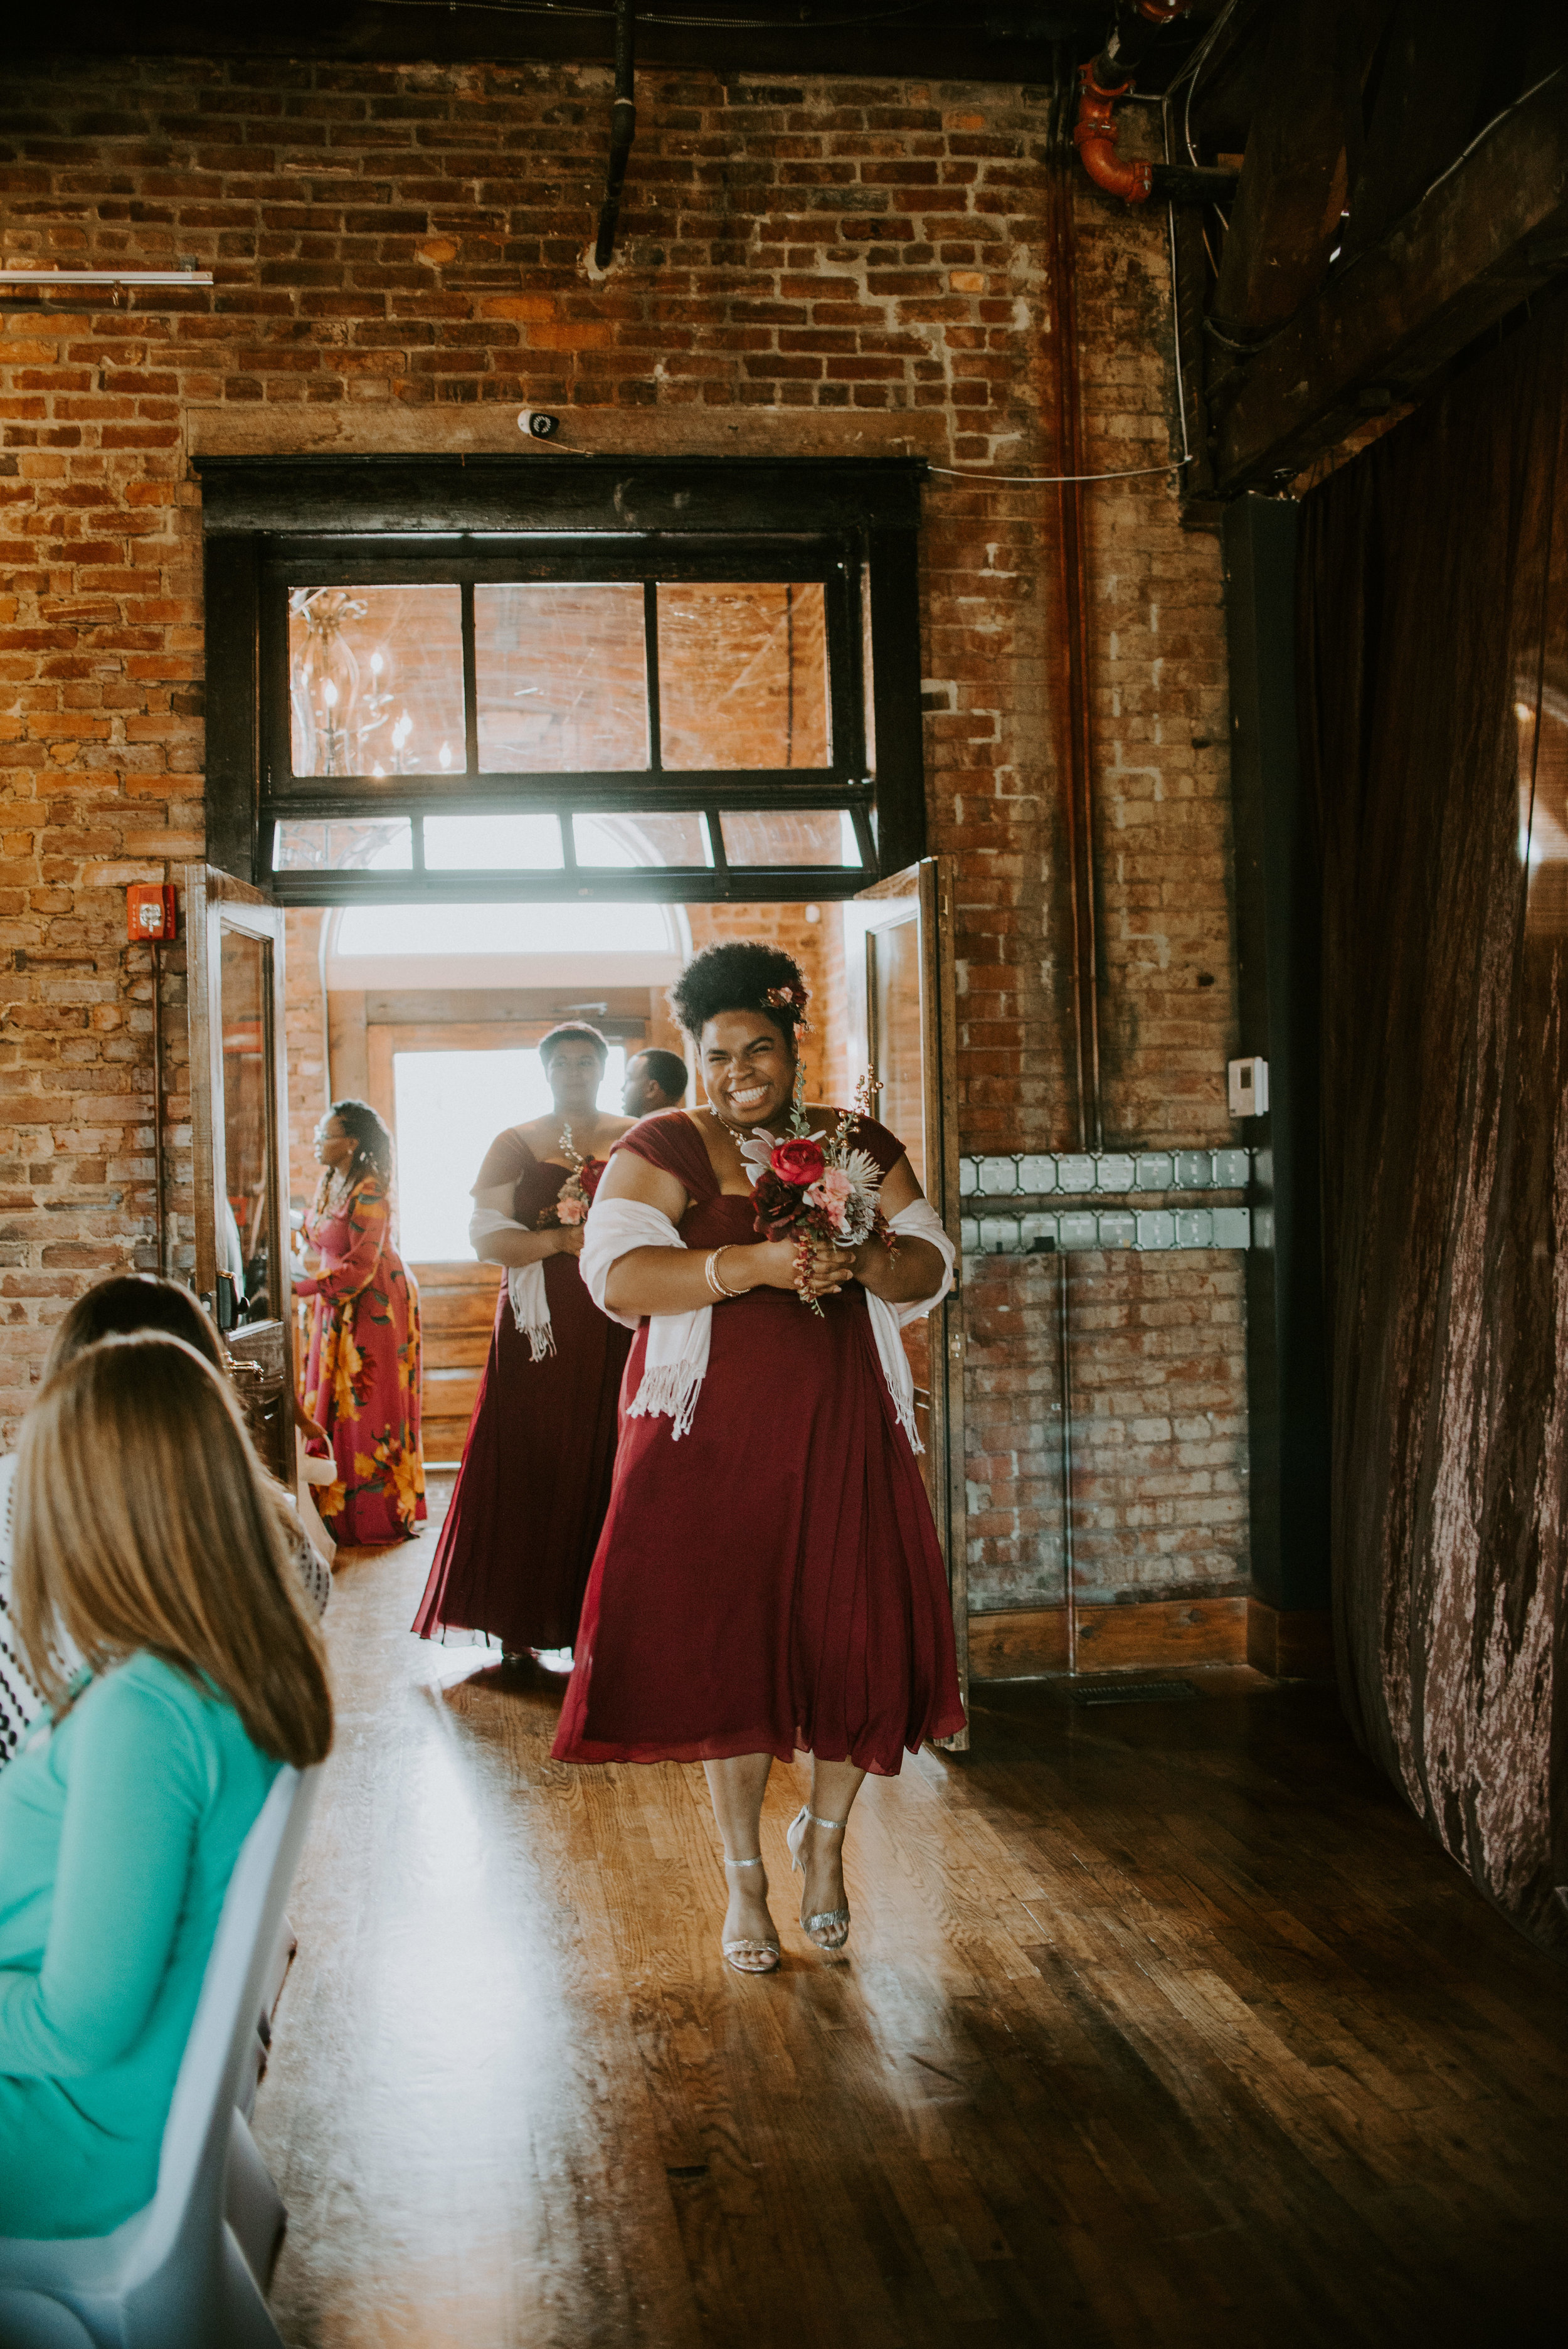 WonderlyCreative_Wedding_6.7.18_Khara&Dwayne_-444.jpg